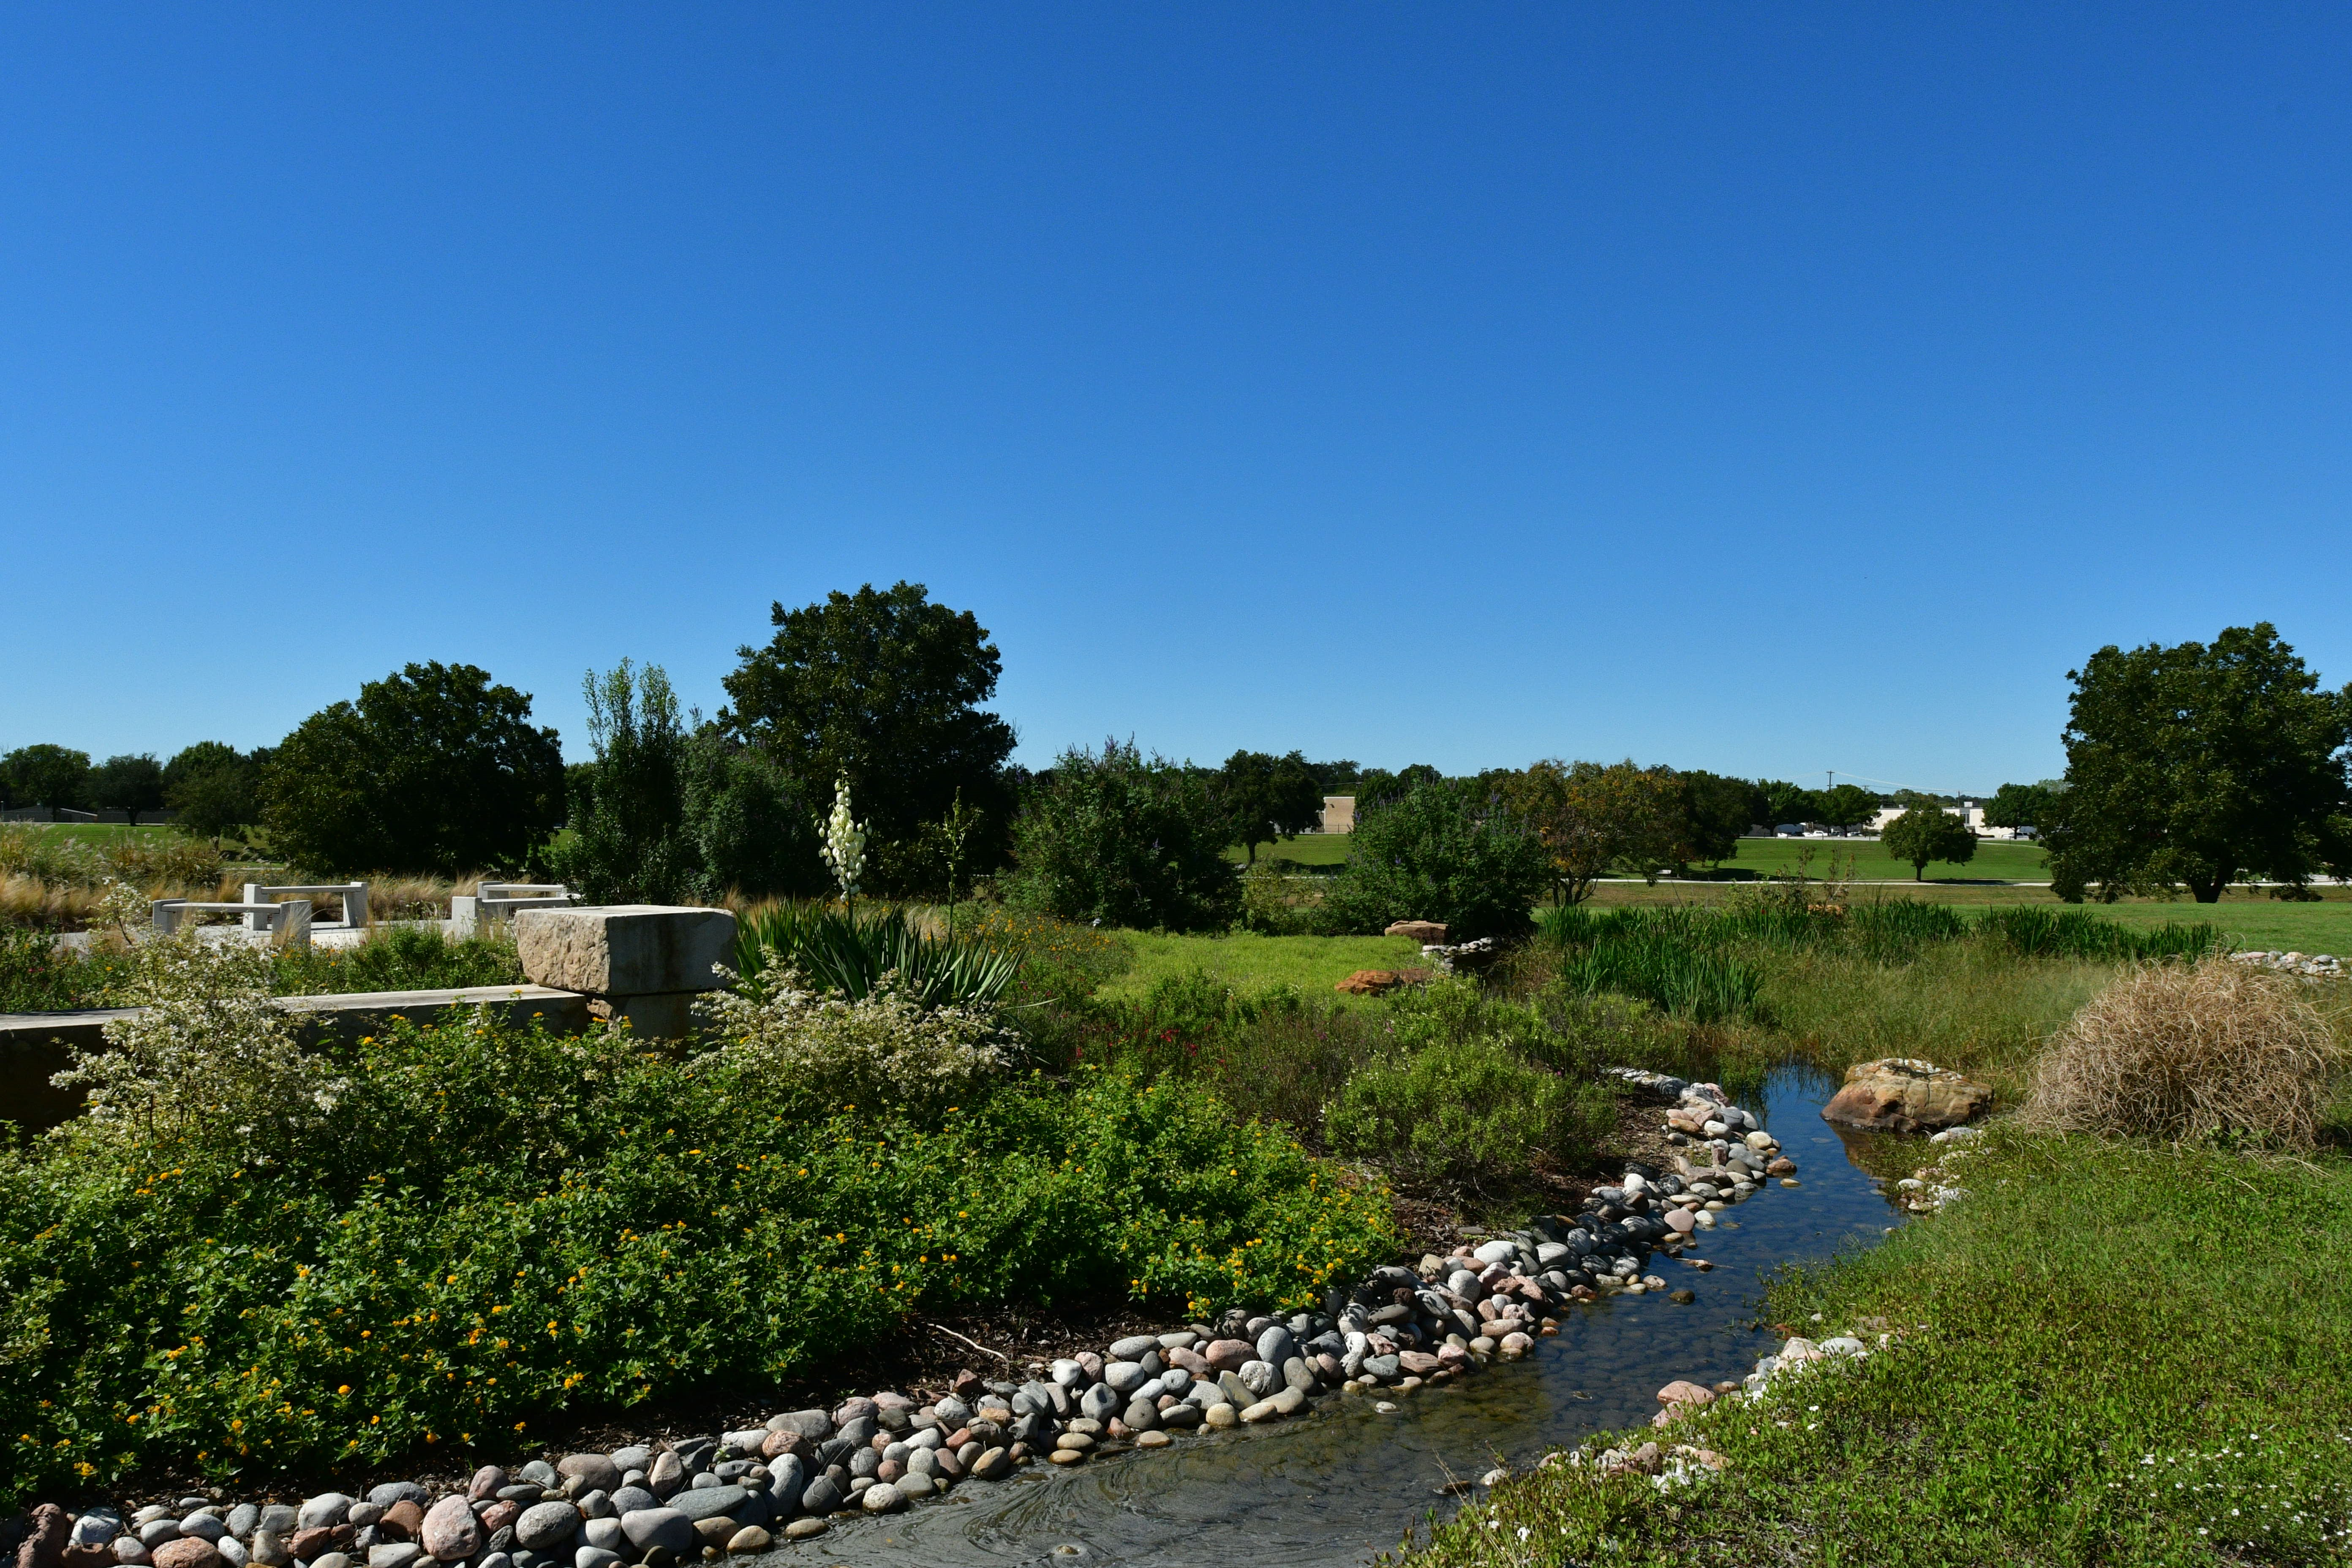 Gardening in North Texas   TRWD